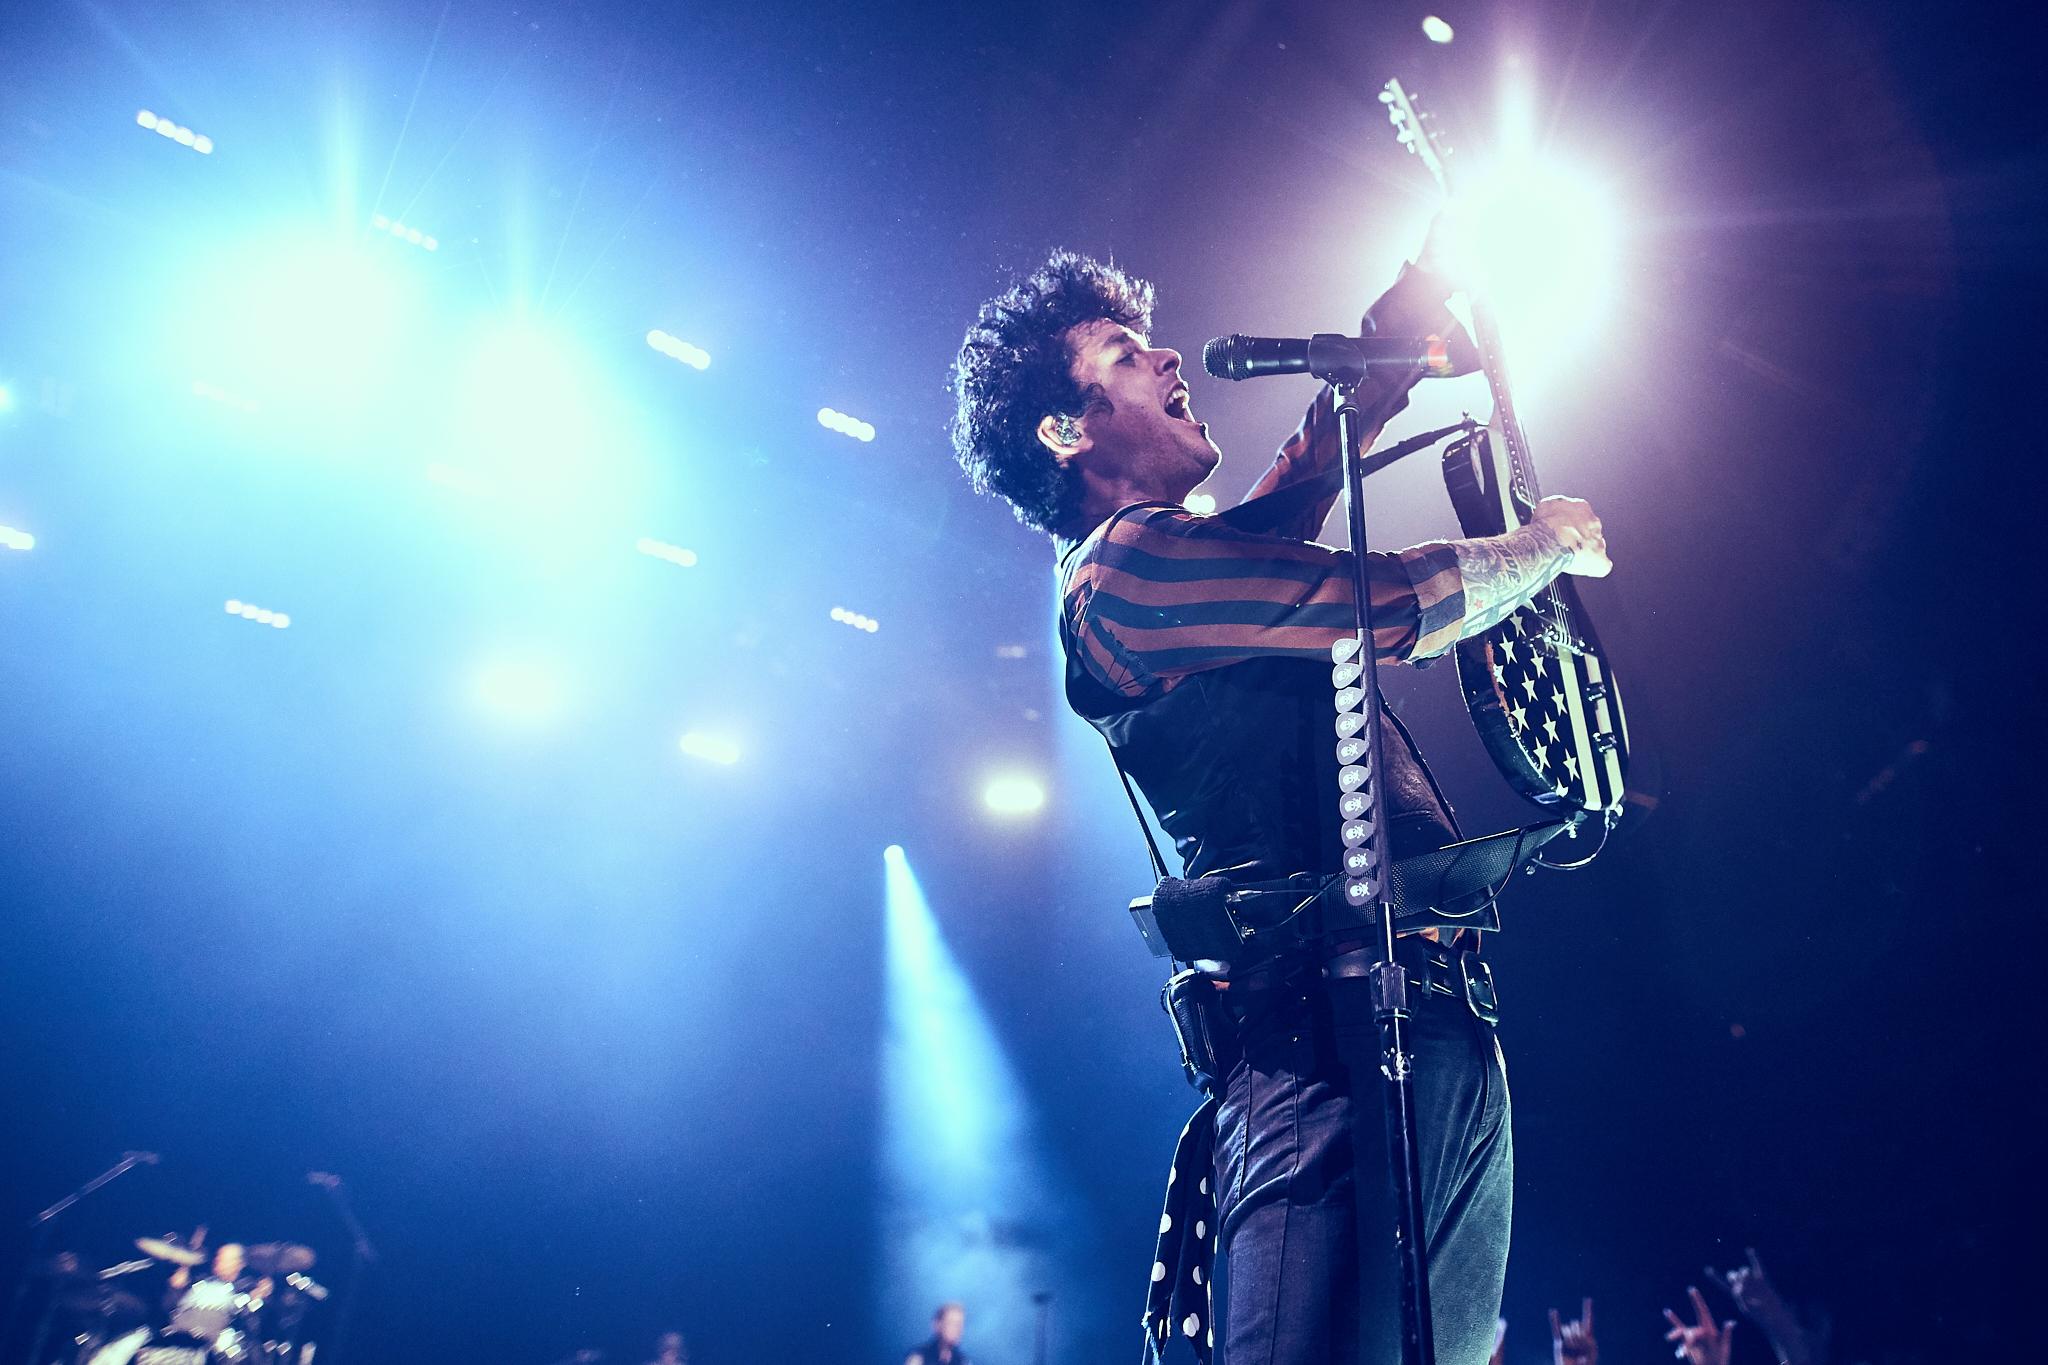 Green_Day_at_Xcel_Energy_Center_04_01_2017_Photos_By_Joe_Lemke_036.jpg